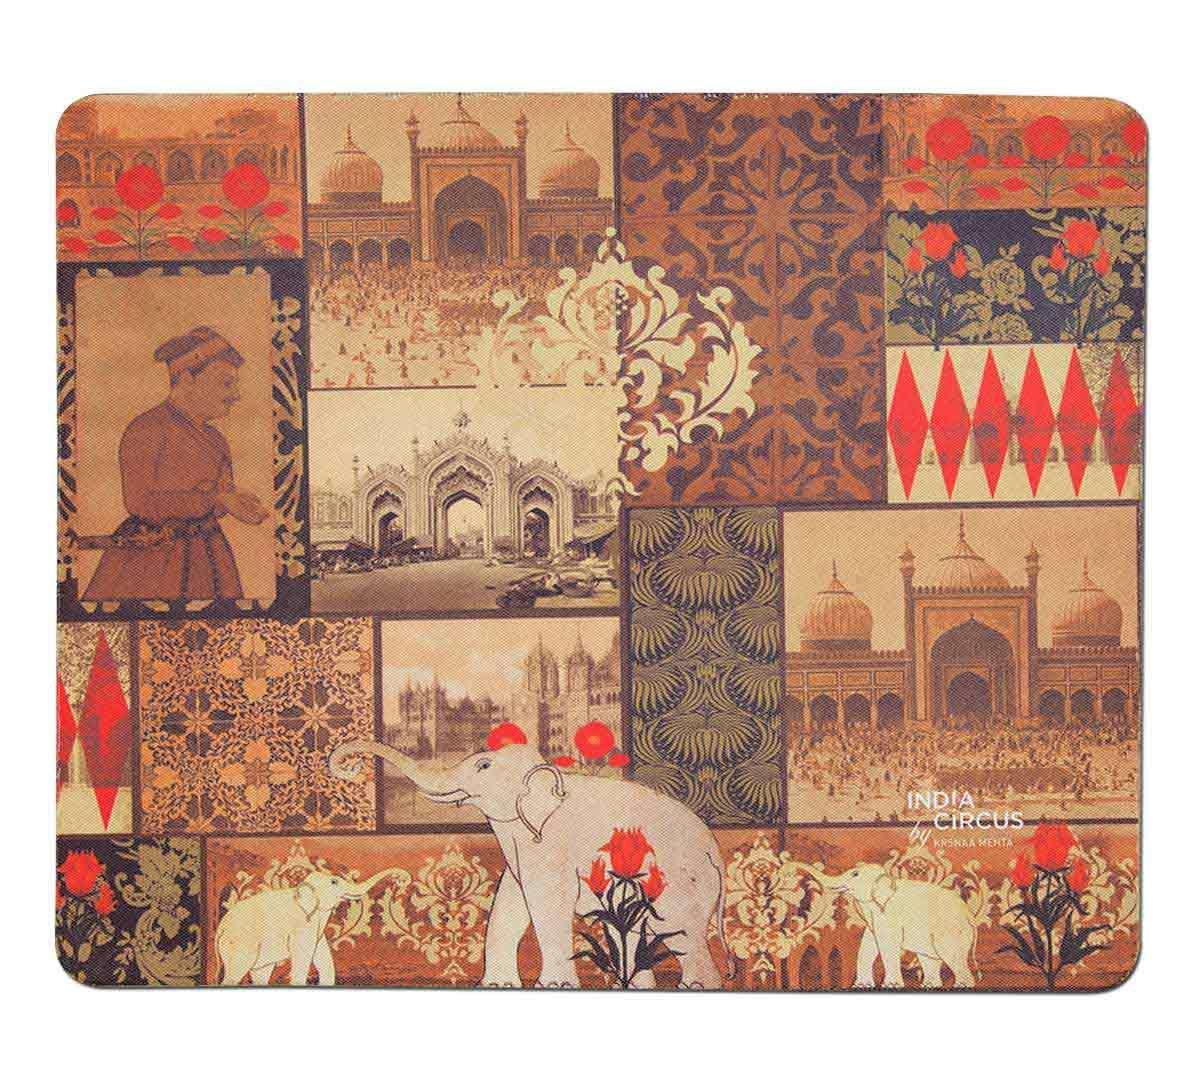 India Circus The Mughal Era Mouse Pad